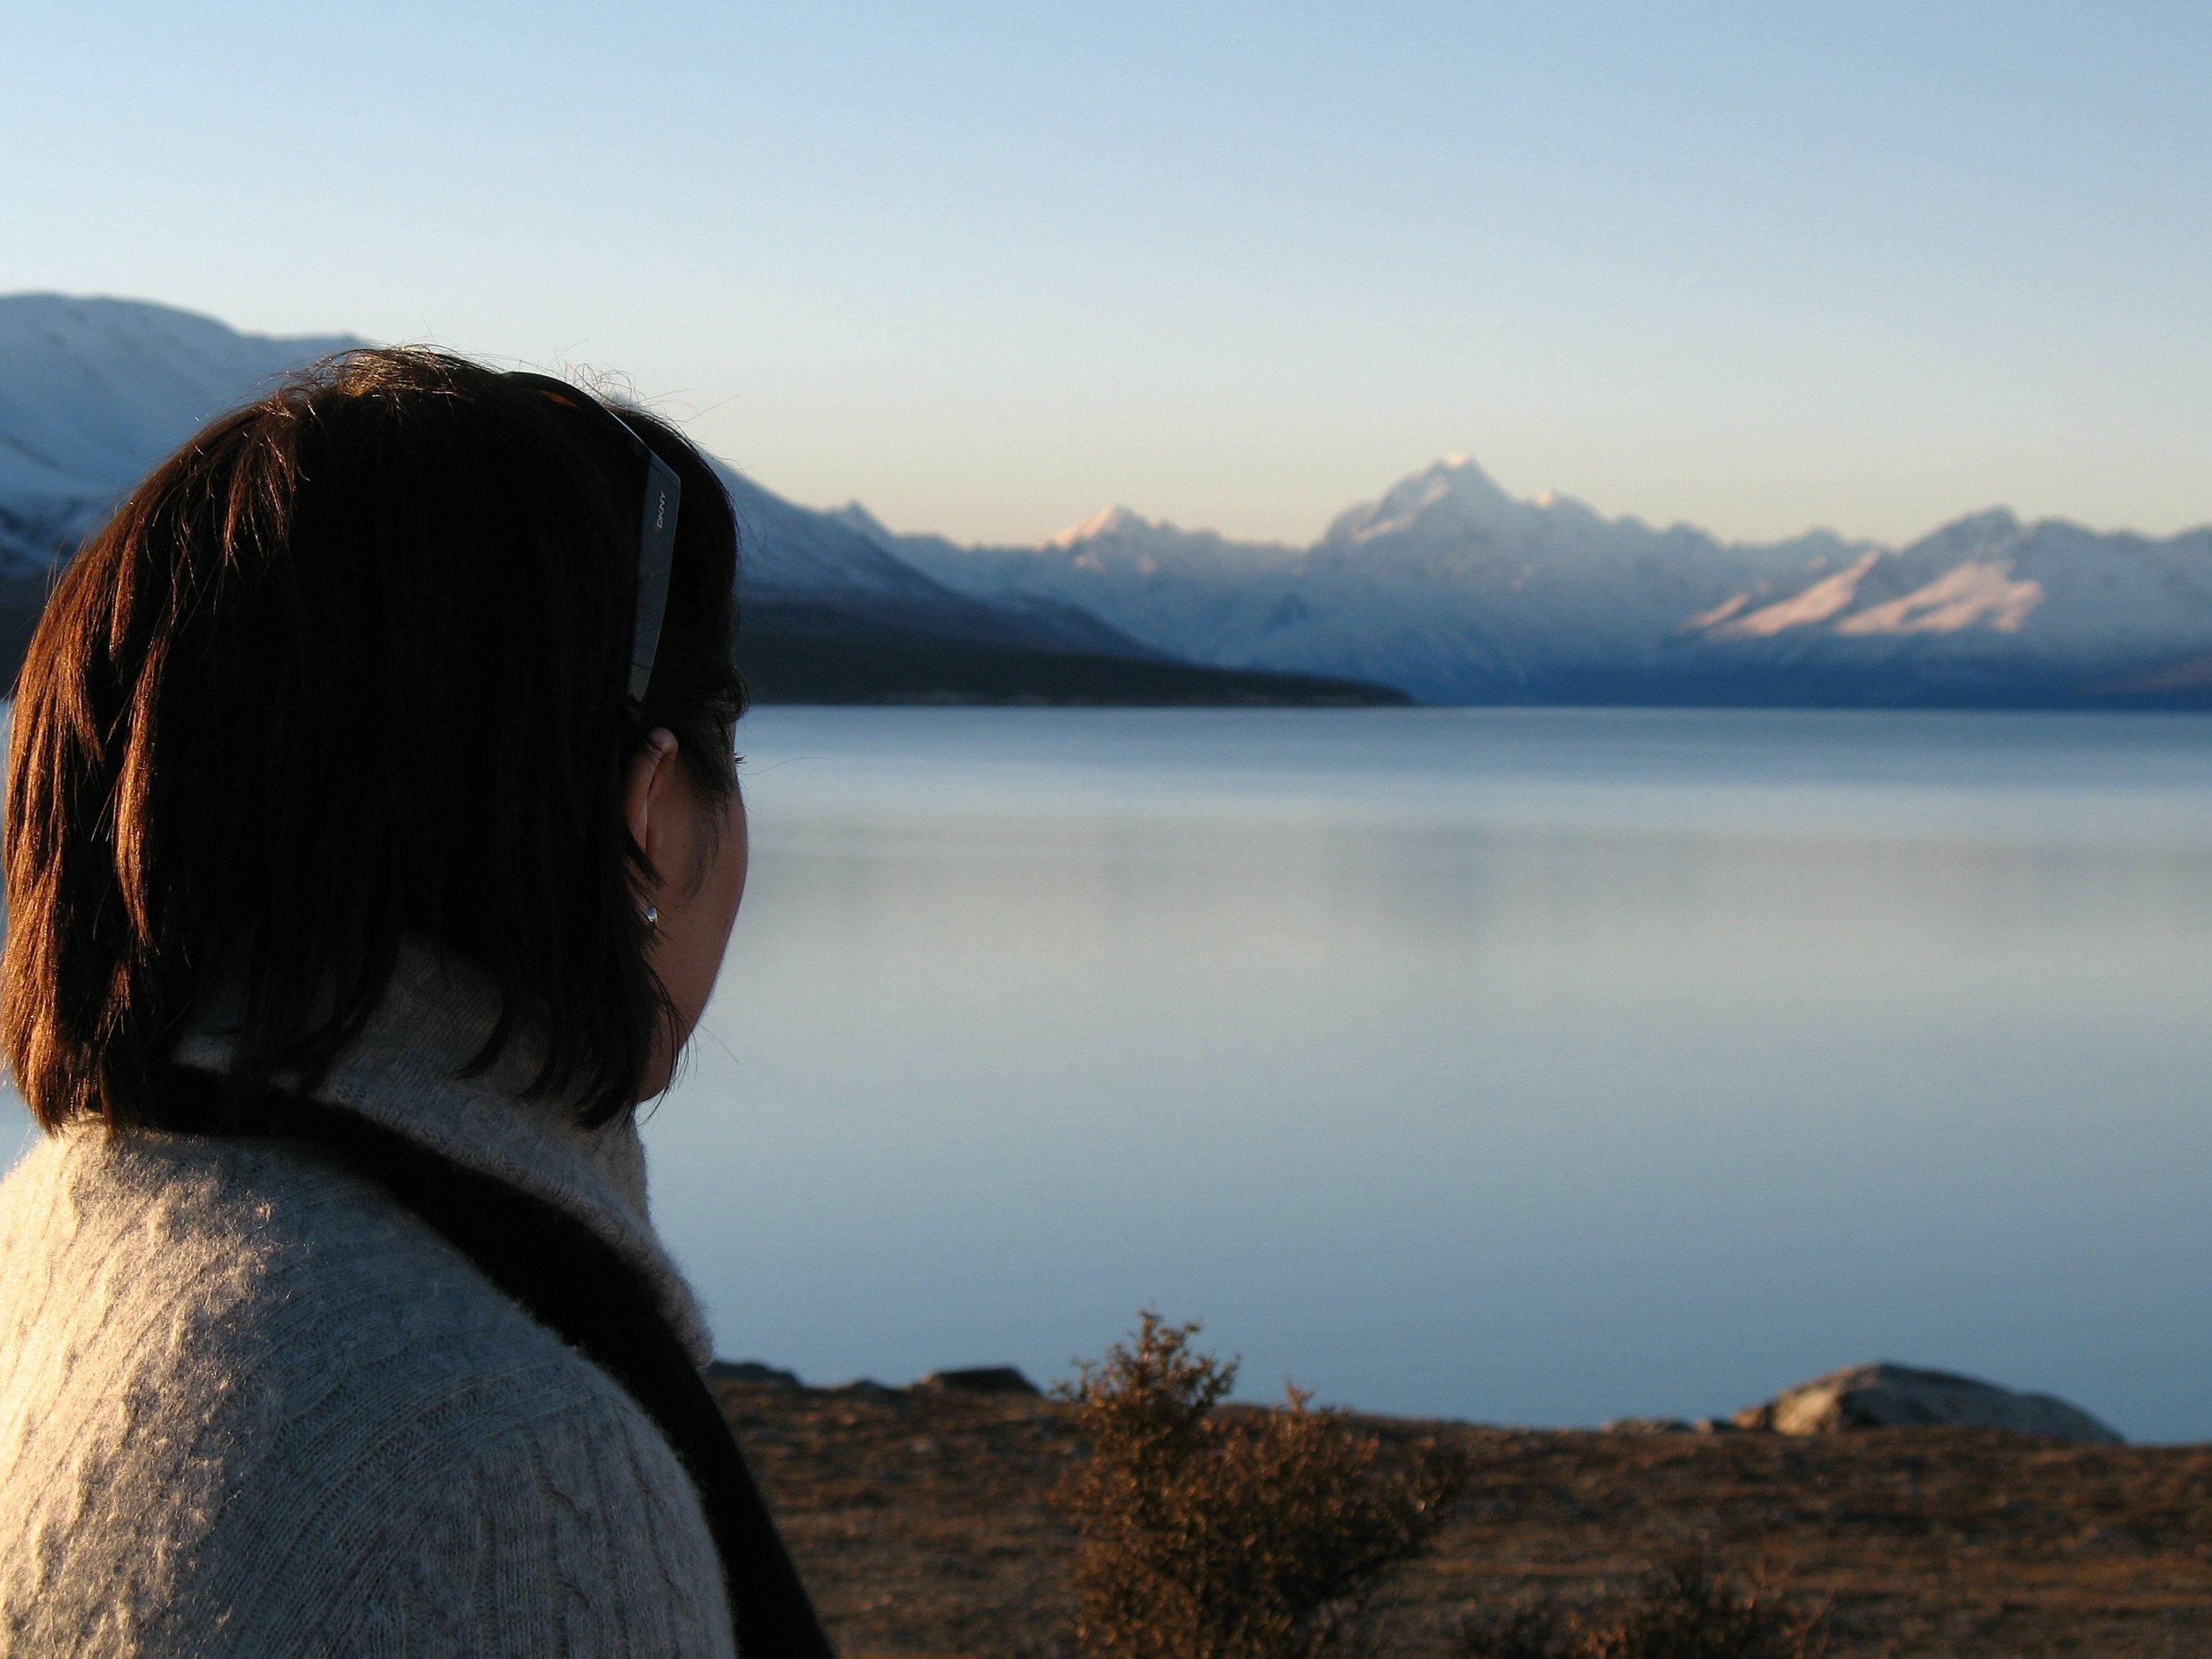 Location: Aoraki Mt. Cook National Park, New Zealand